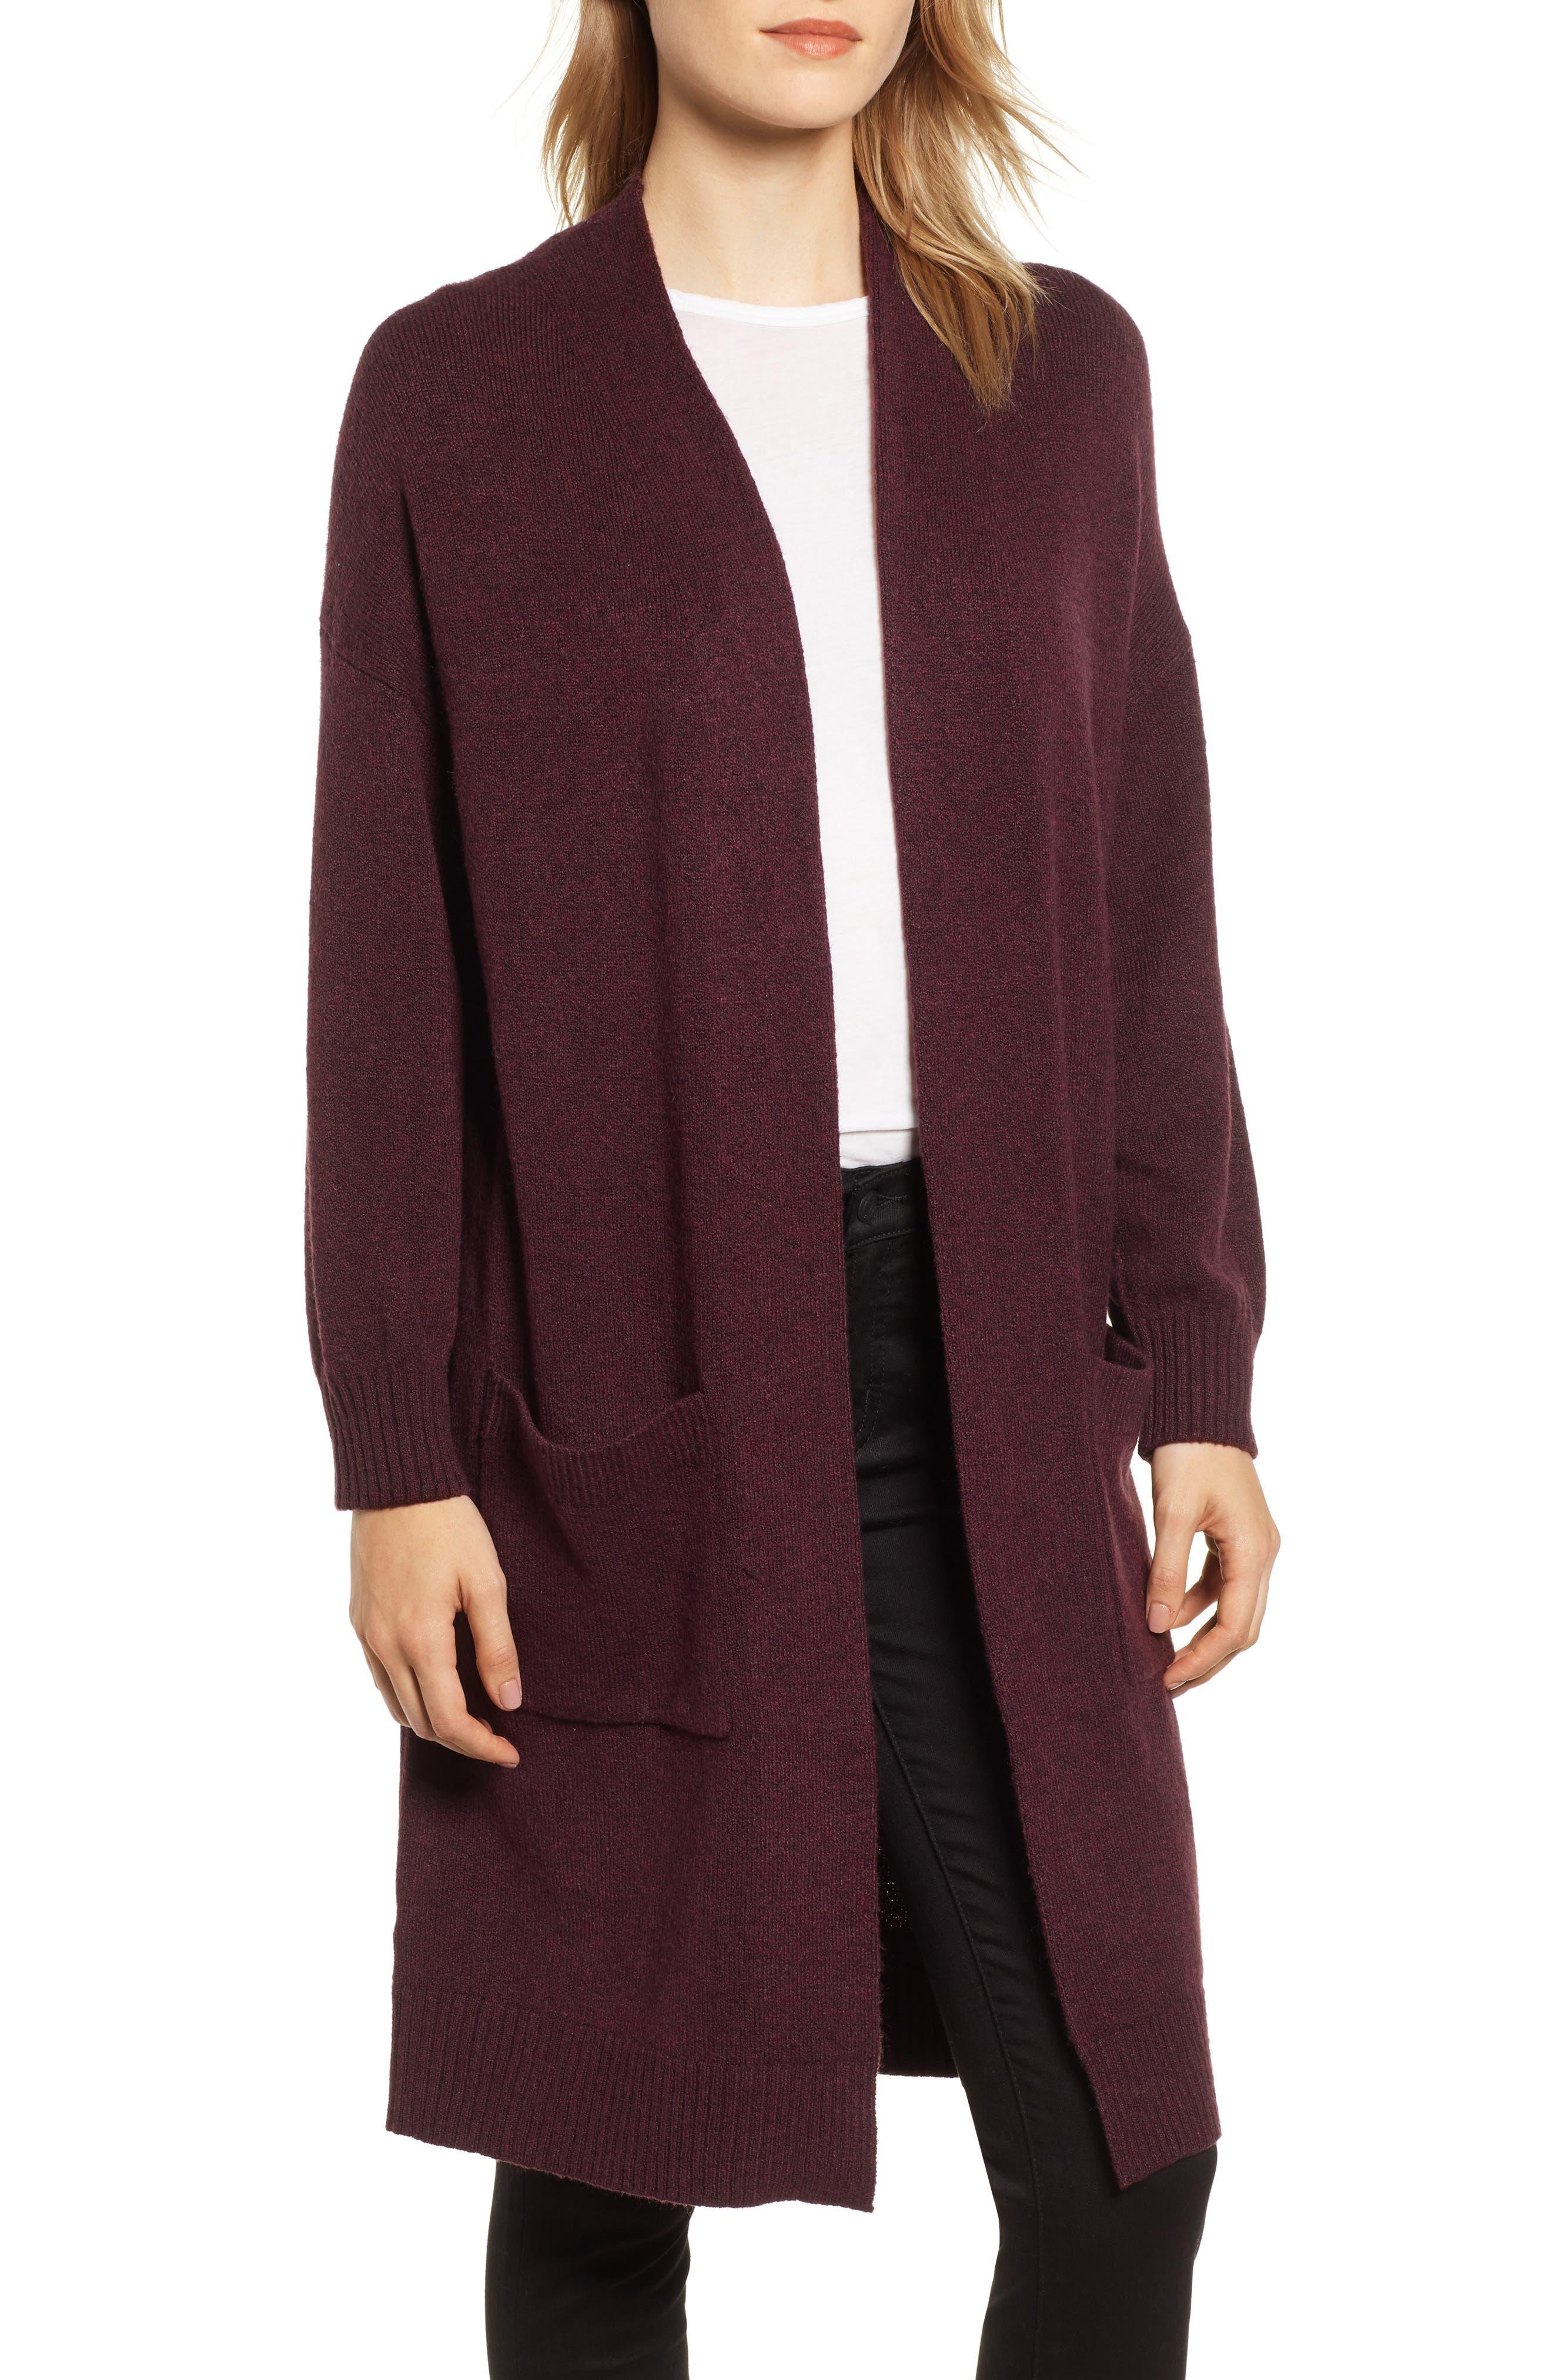 Pocket Sweater Coat,                             Main thumbnail 1, color,                             BURGUNDY TO MATCH DRESS